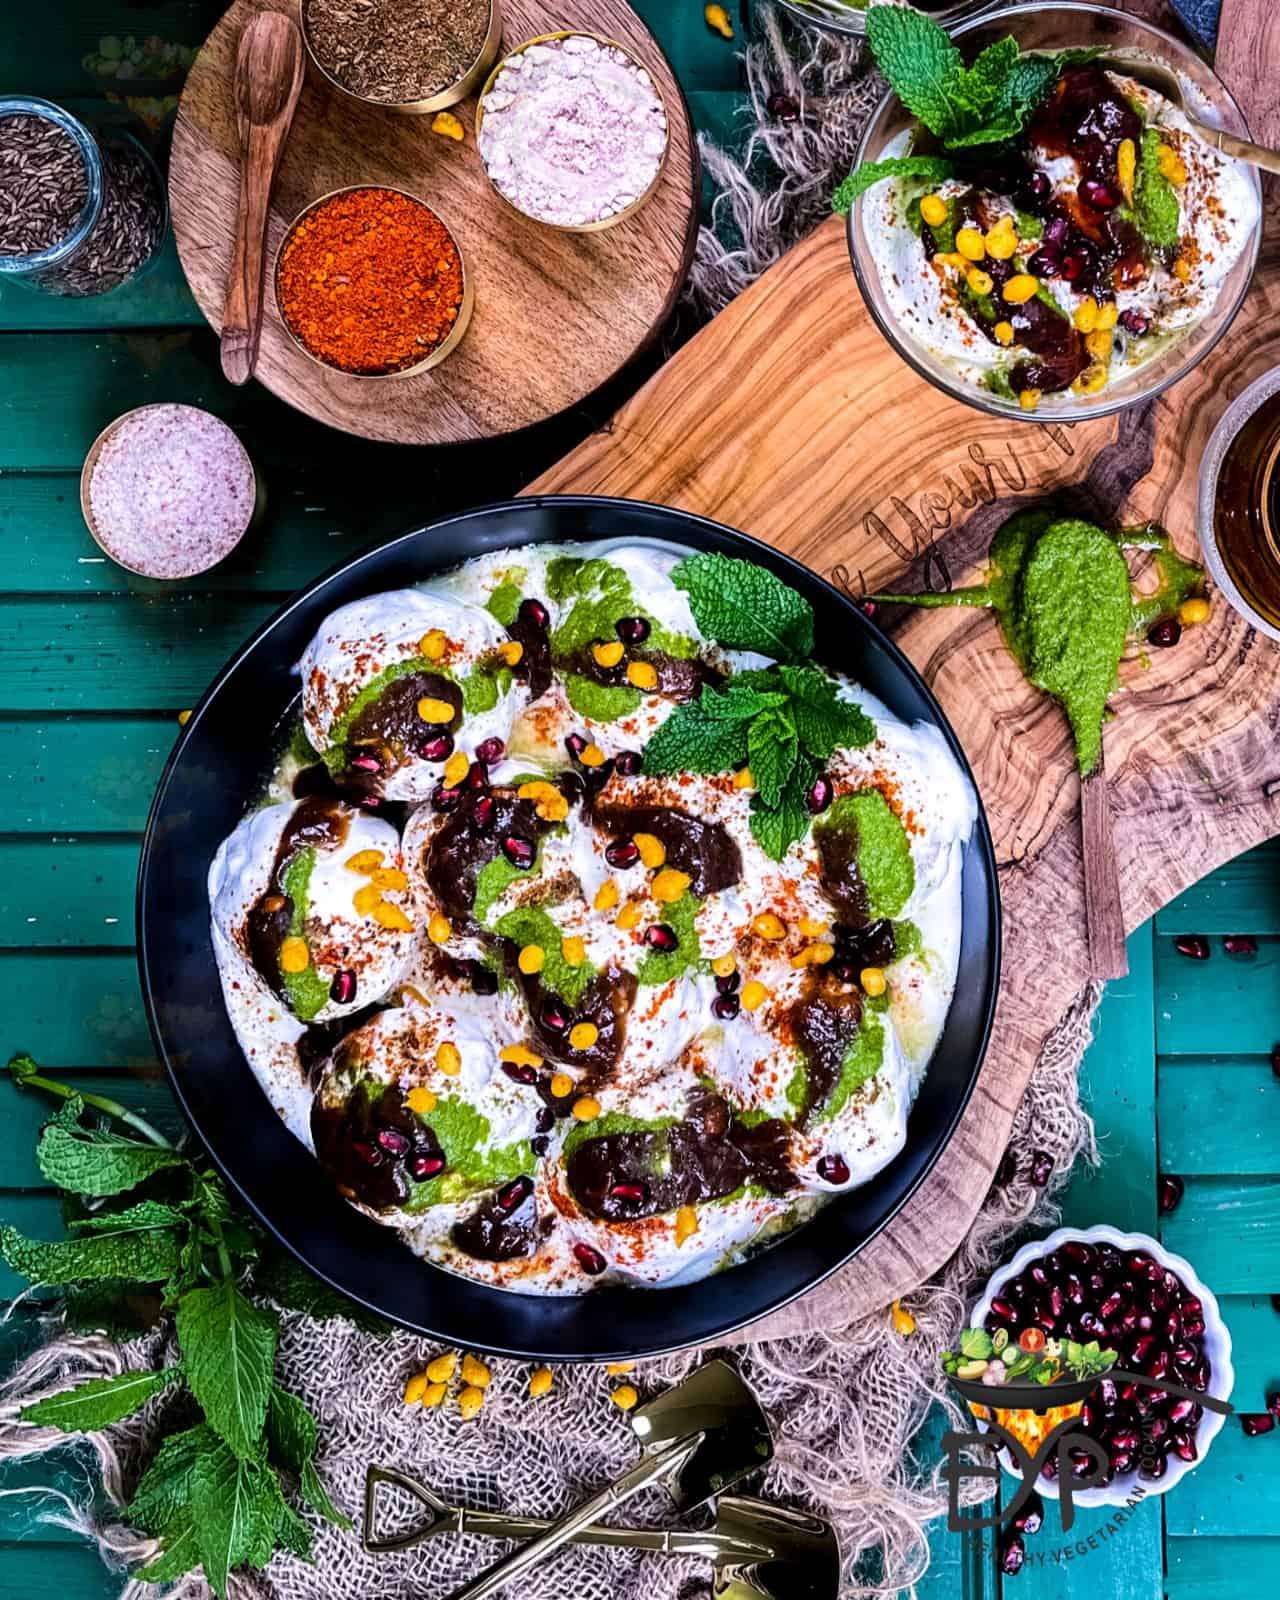 Dahi Bhalla served in a bowl with chutneys